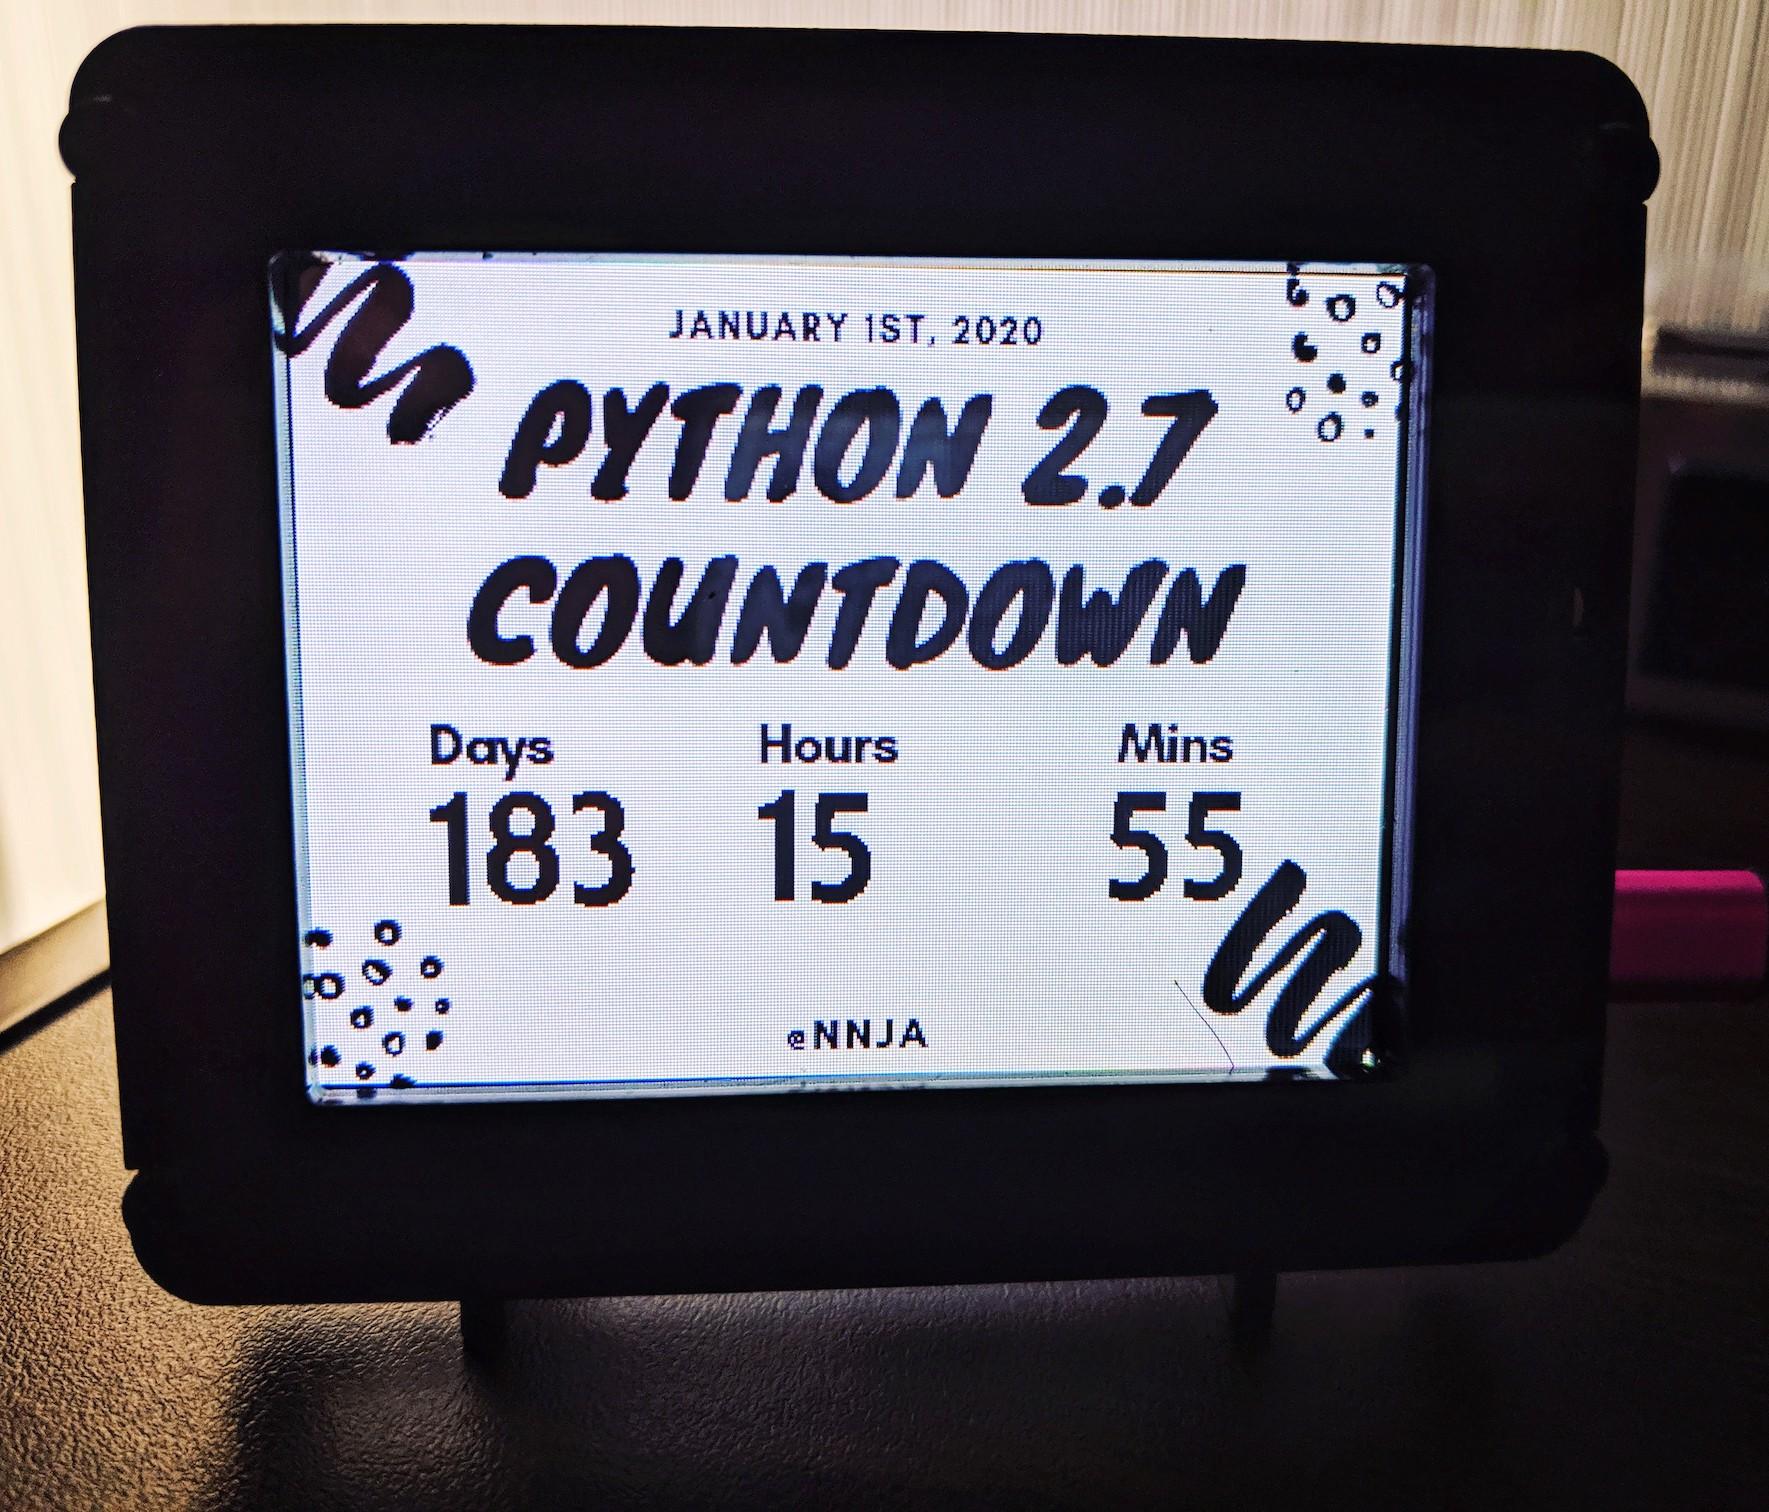 A Desktop Python 2 7 Countdown Timer with CircuitPython and